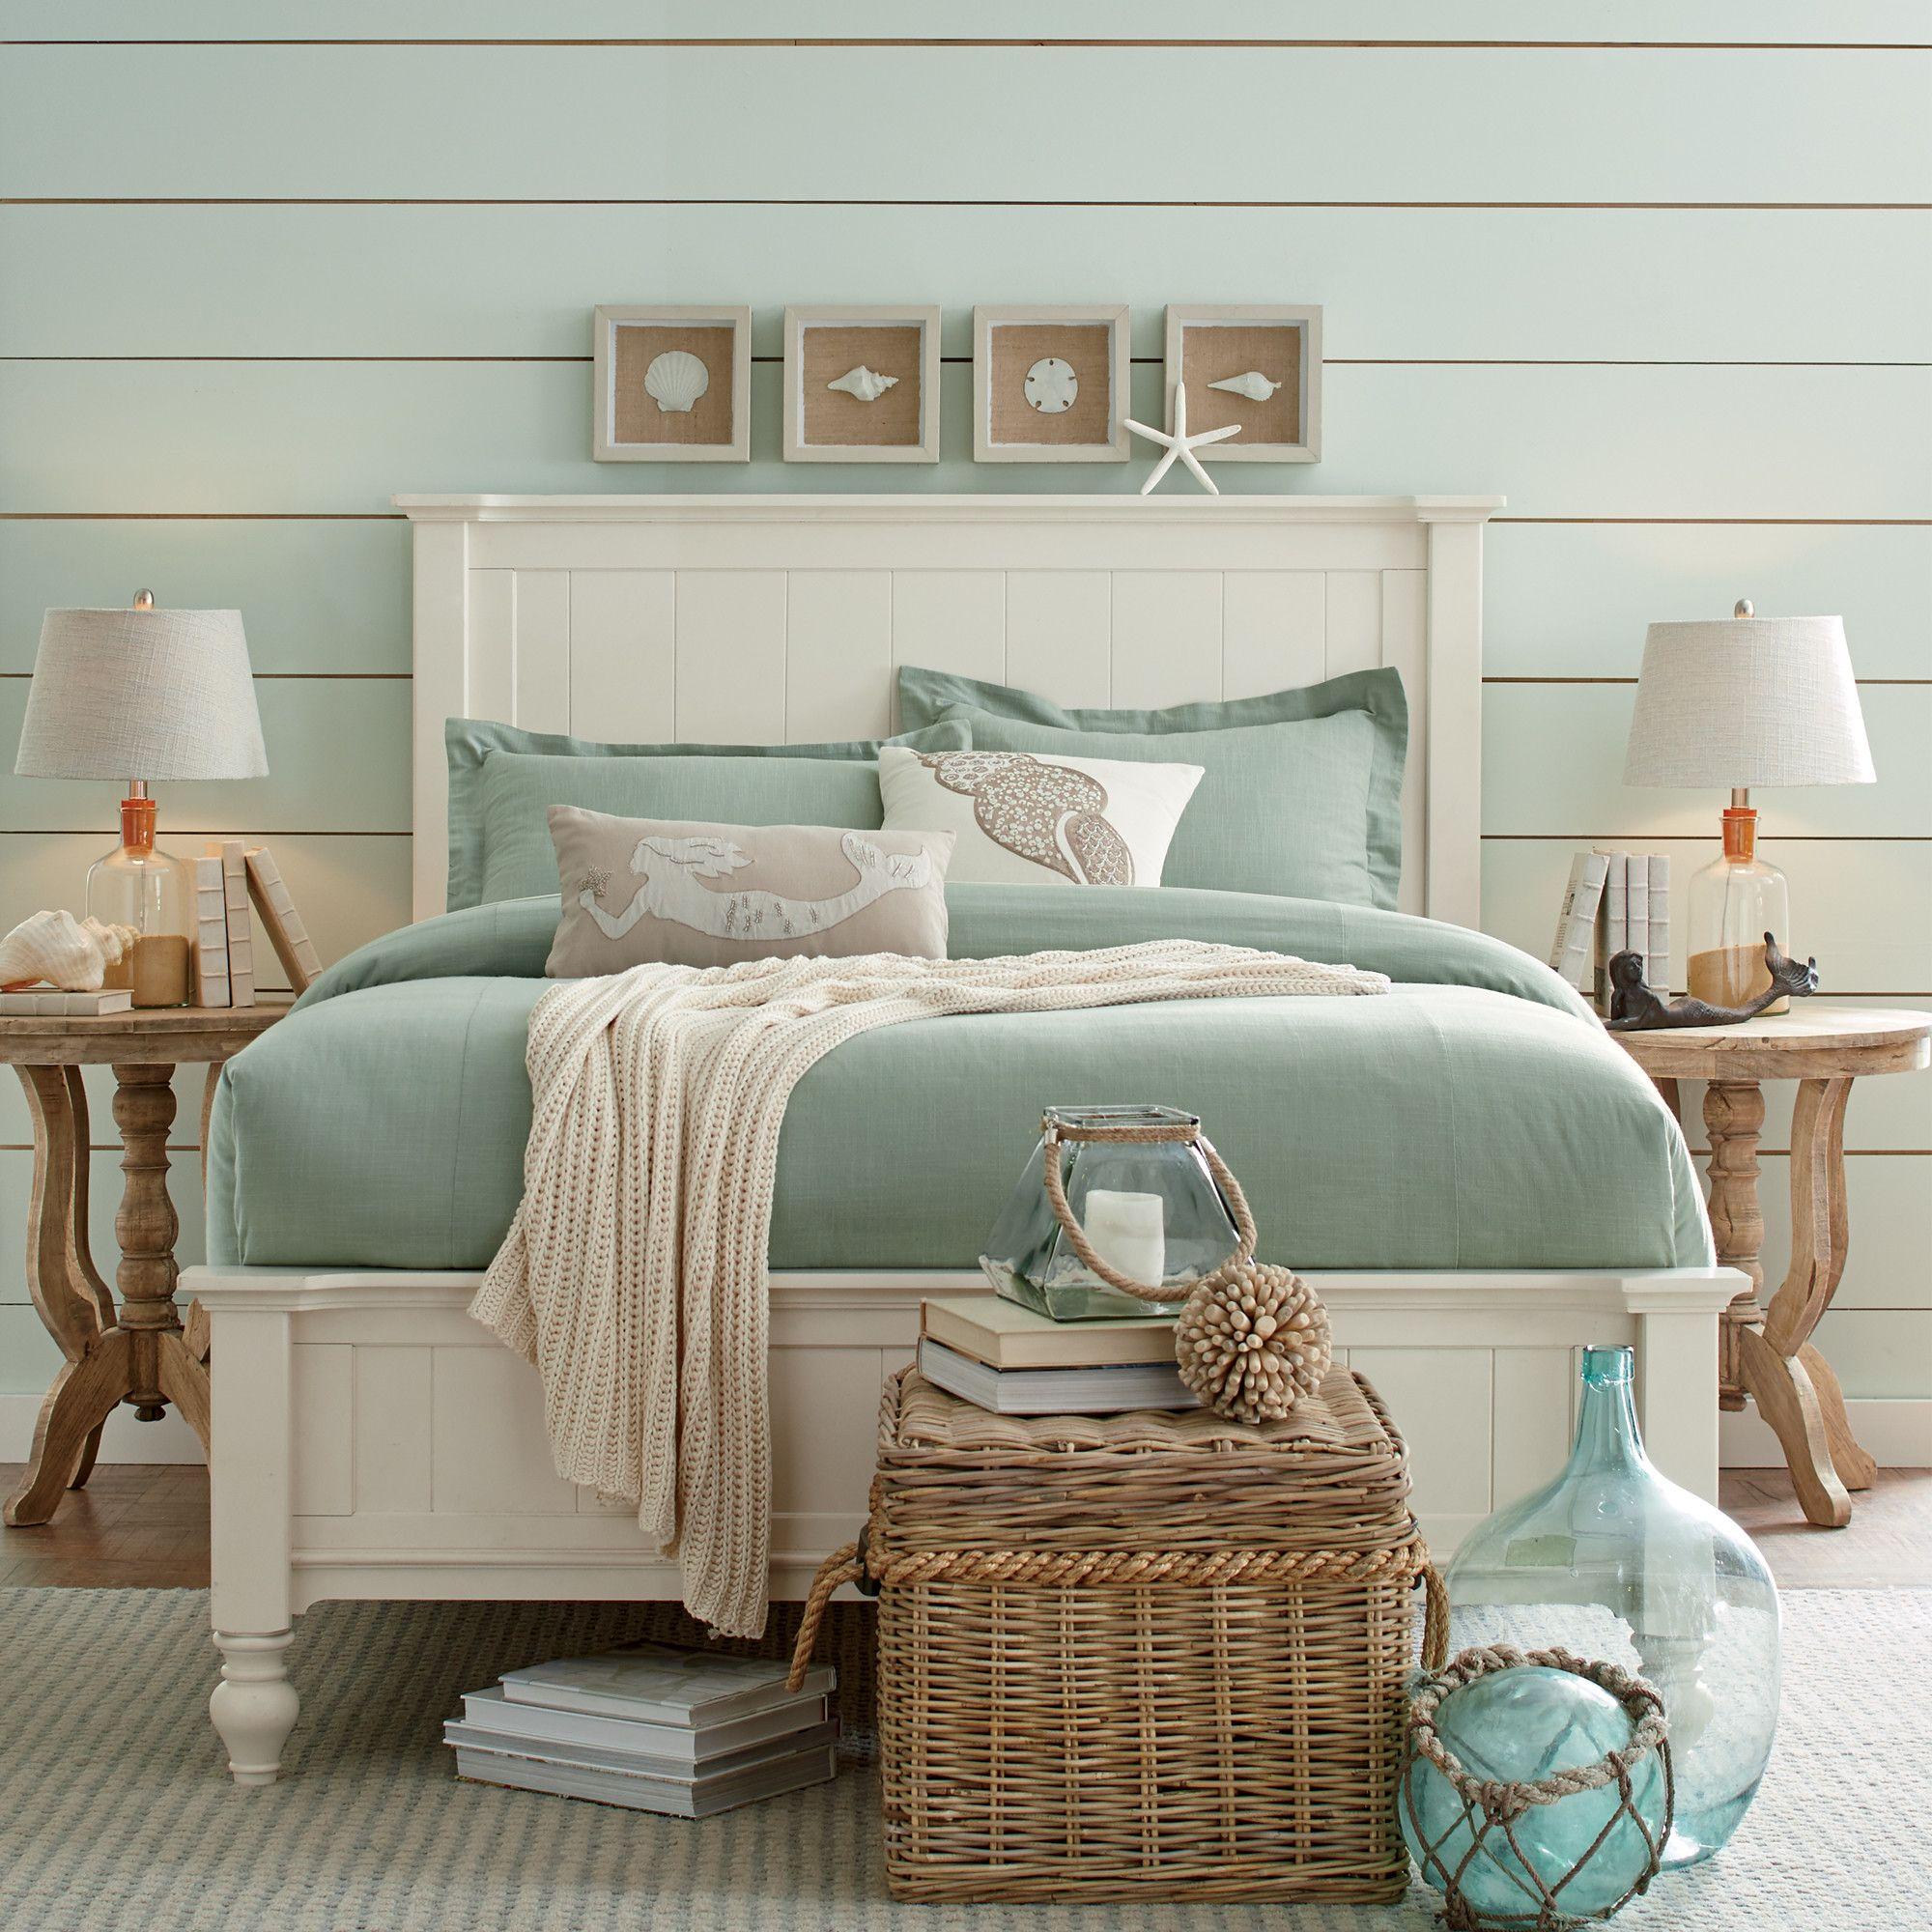 Seashell Wall Decor Set Coastal Decorating Home Bedroom